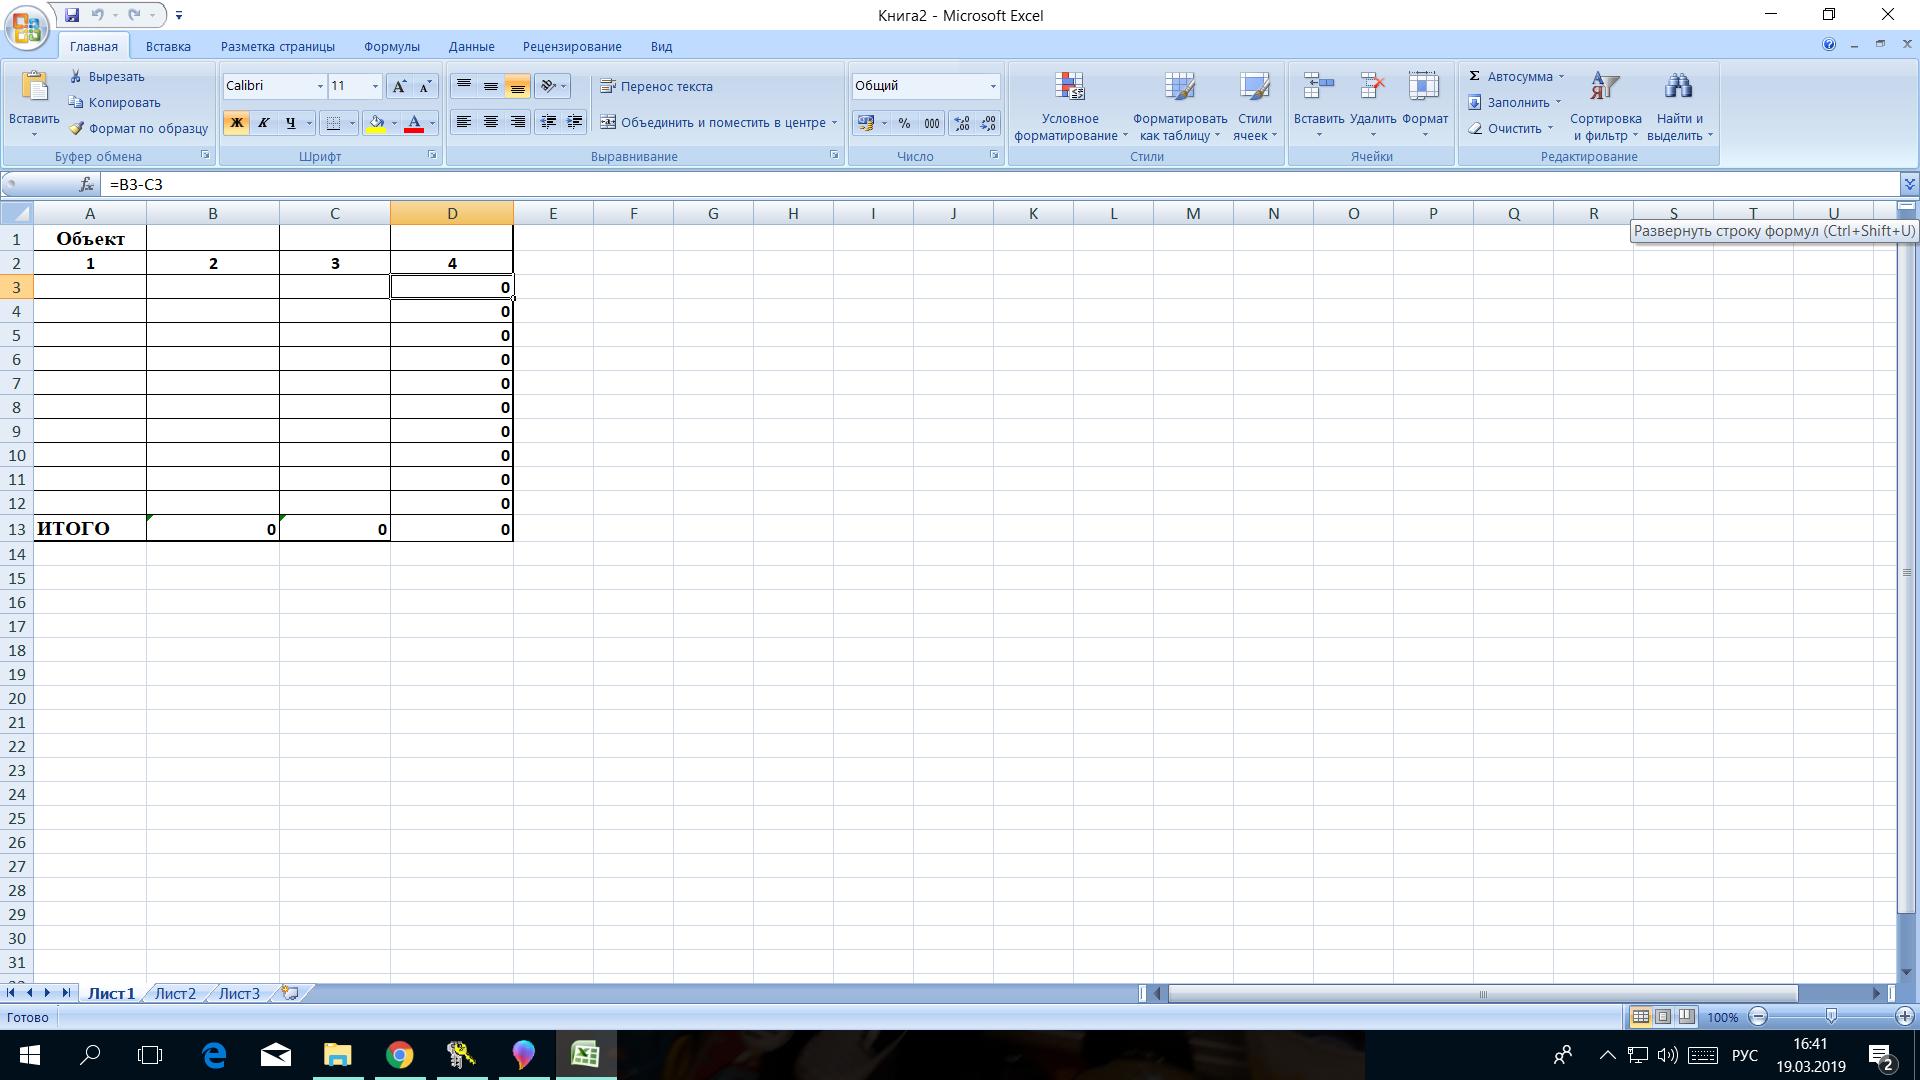 Фото Шаблон таблицы с формулами для расчета